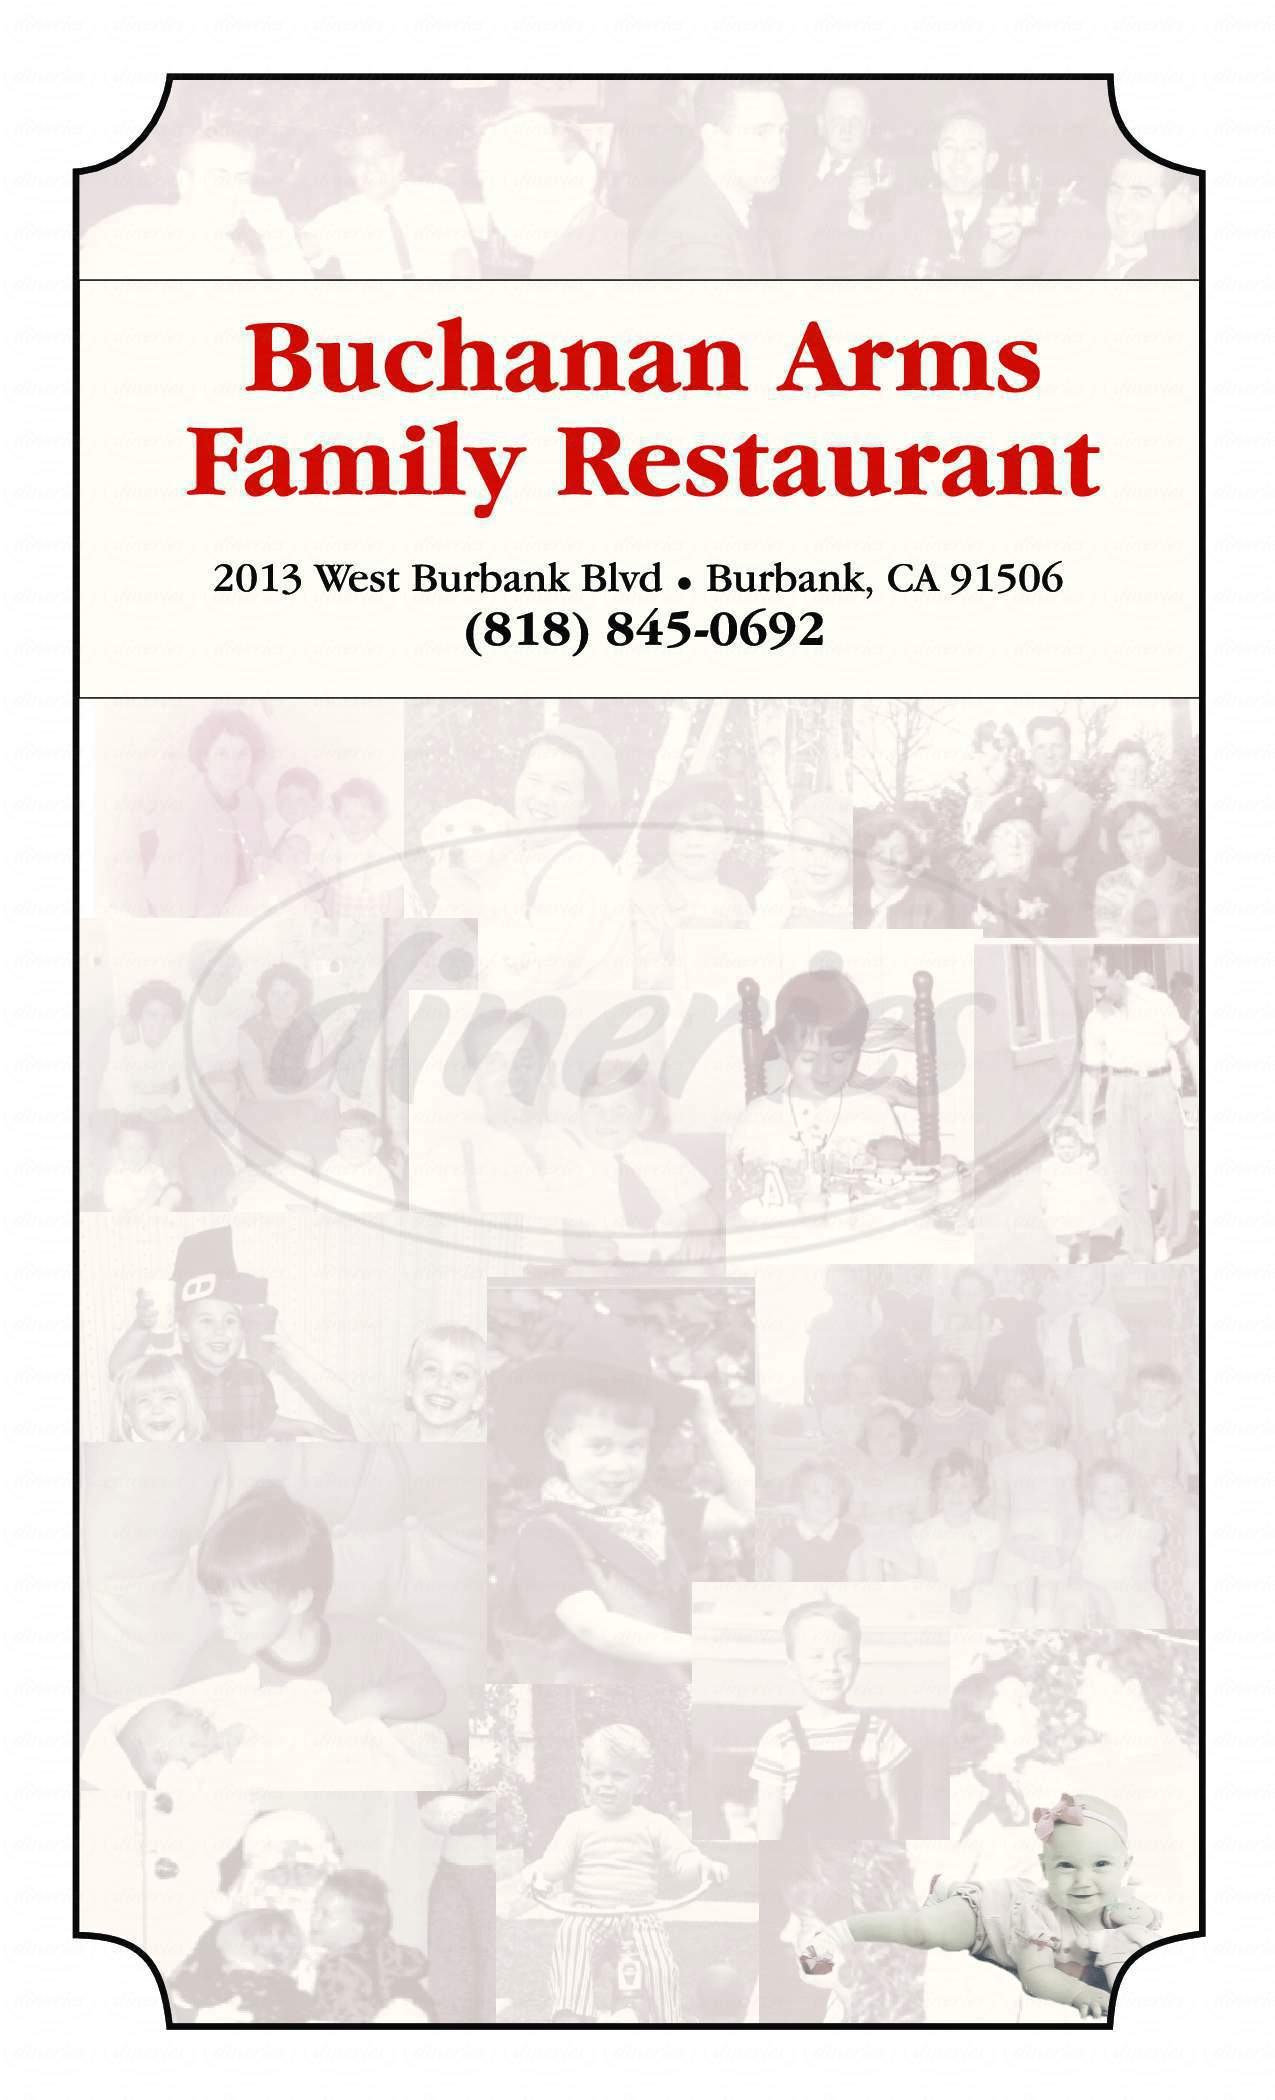 menu for The Buchanan Arms